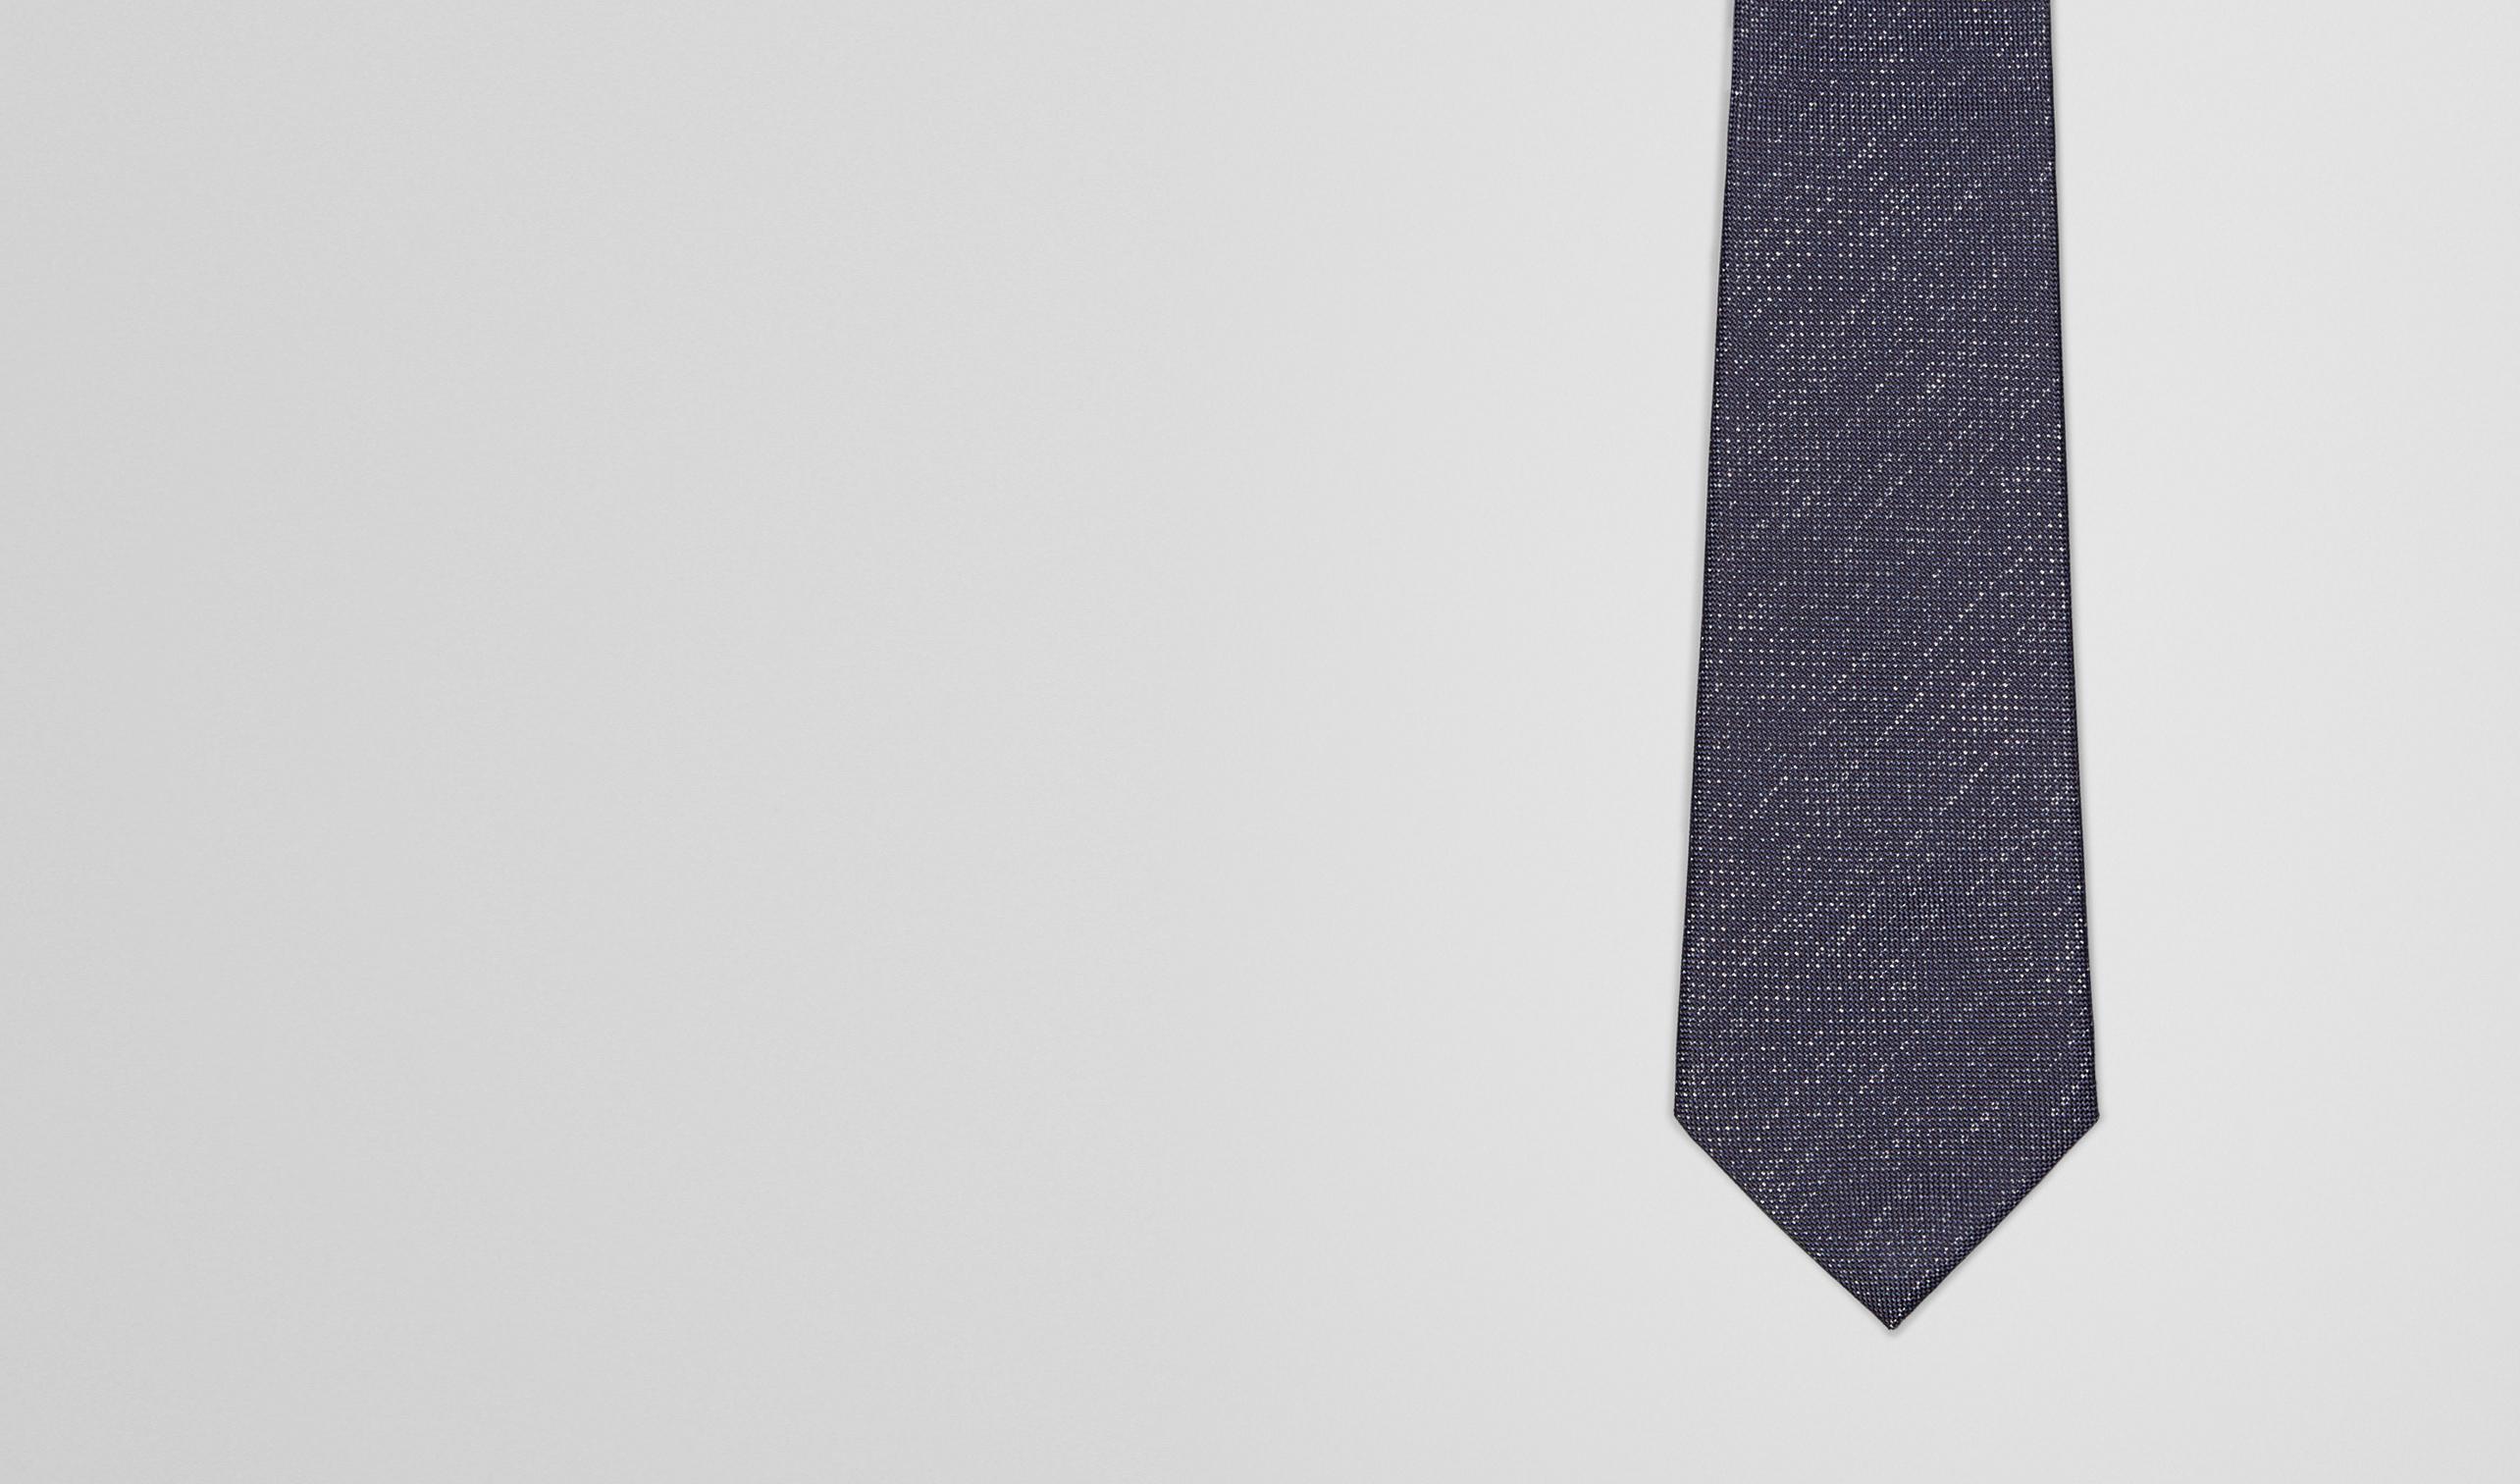 BOTTEGA VENETA Krawatte U SEIDENKRAWATTE ROYAL UND DARK GREY pl